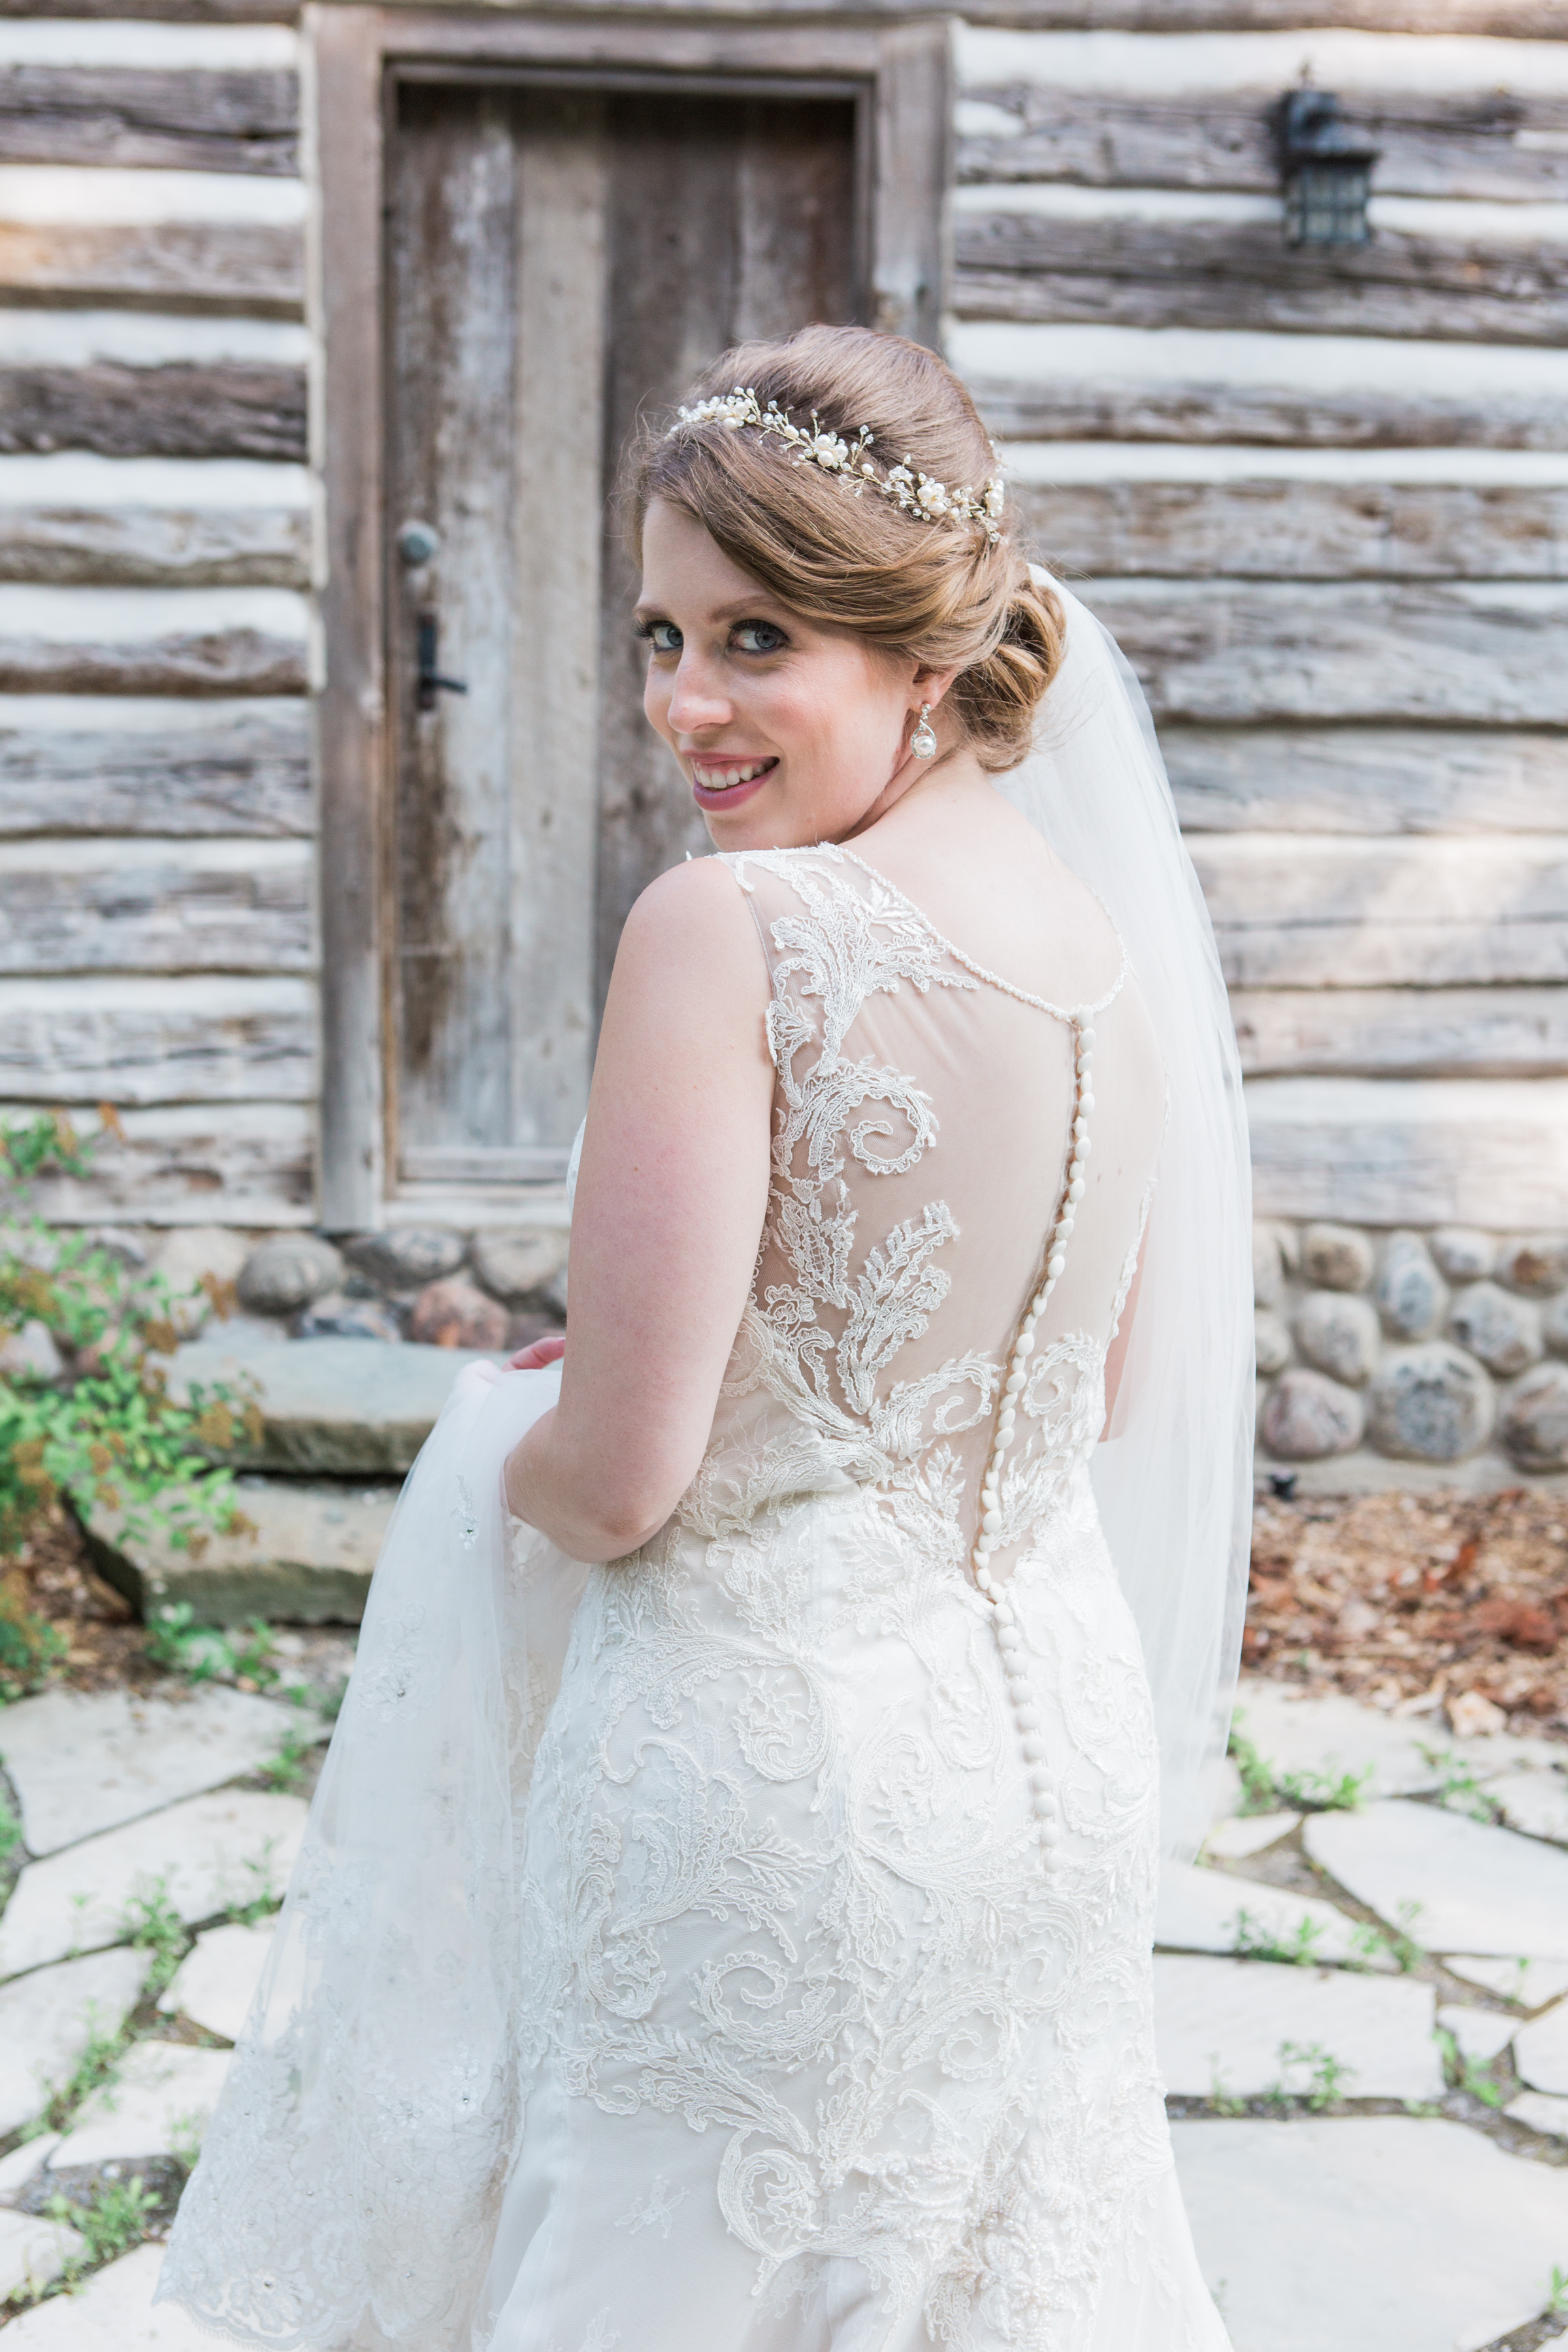 M&S_Mississauga_Wedding_02-8540 - Copy - Copy - Copy - Copy.jpg